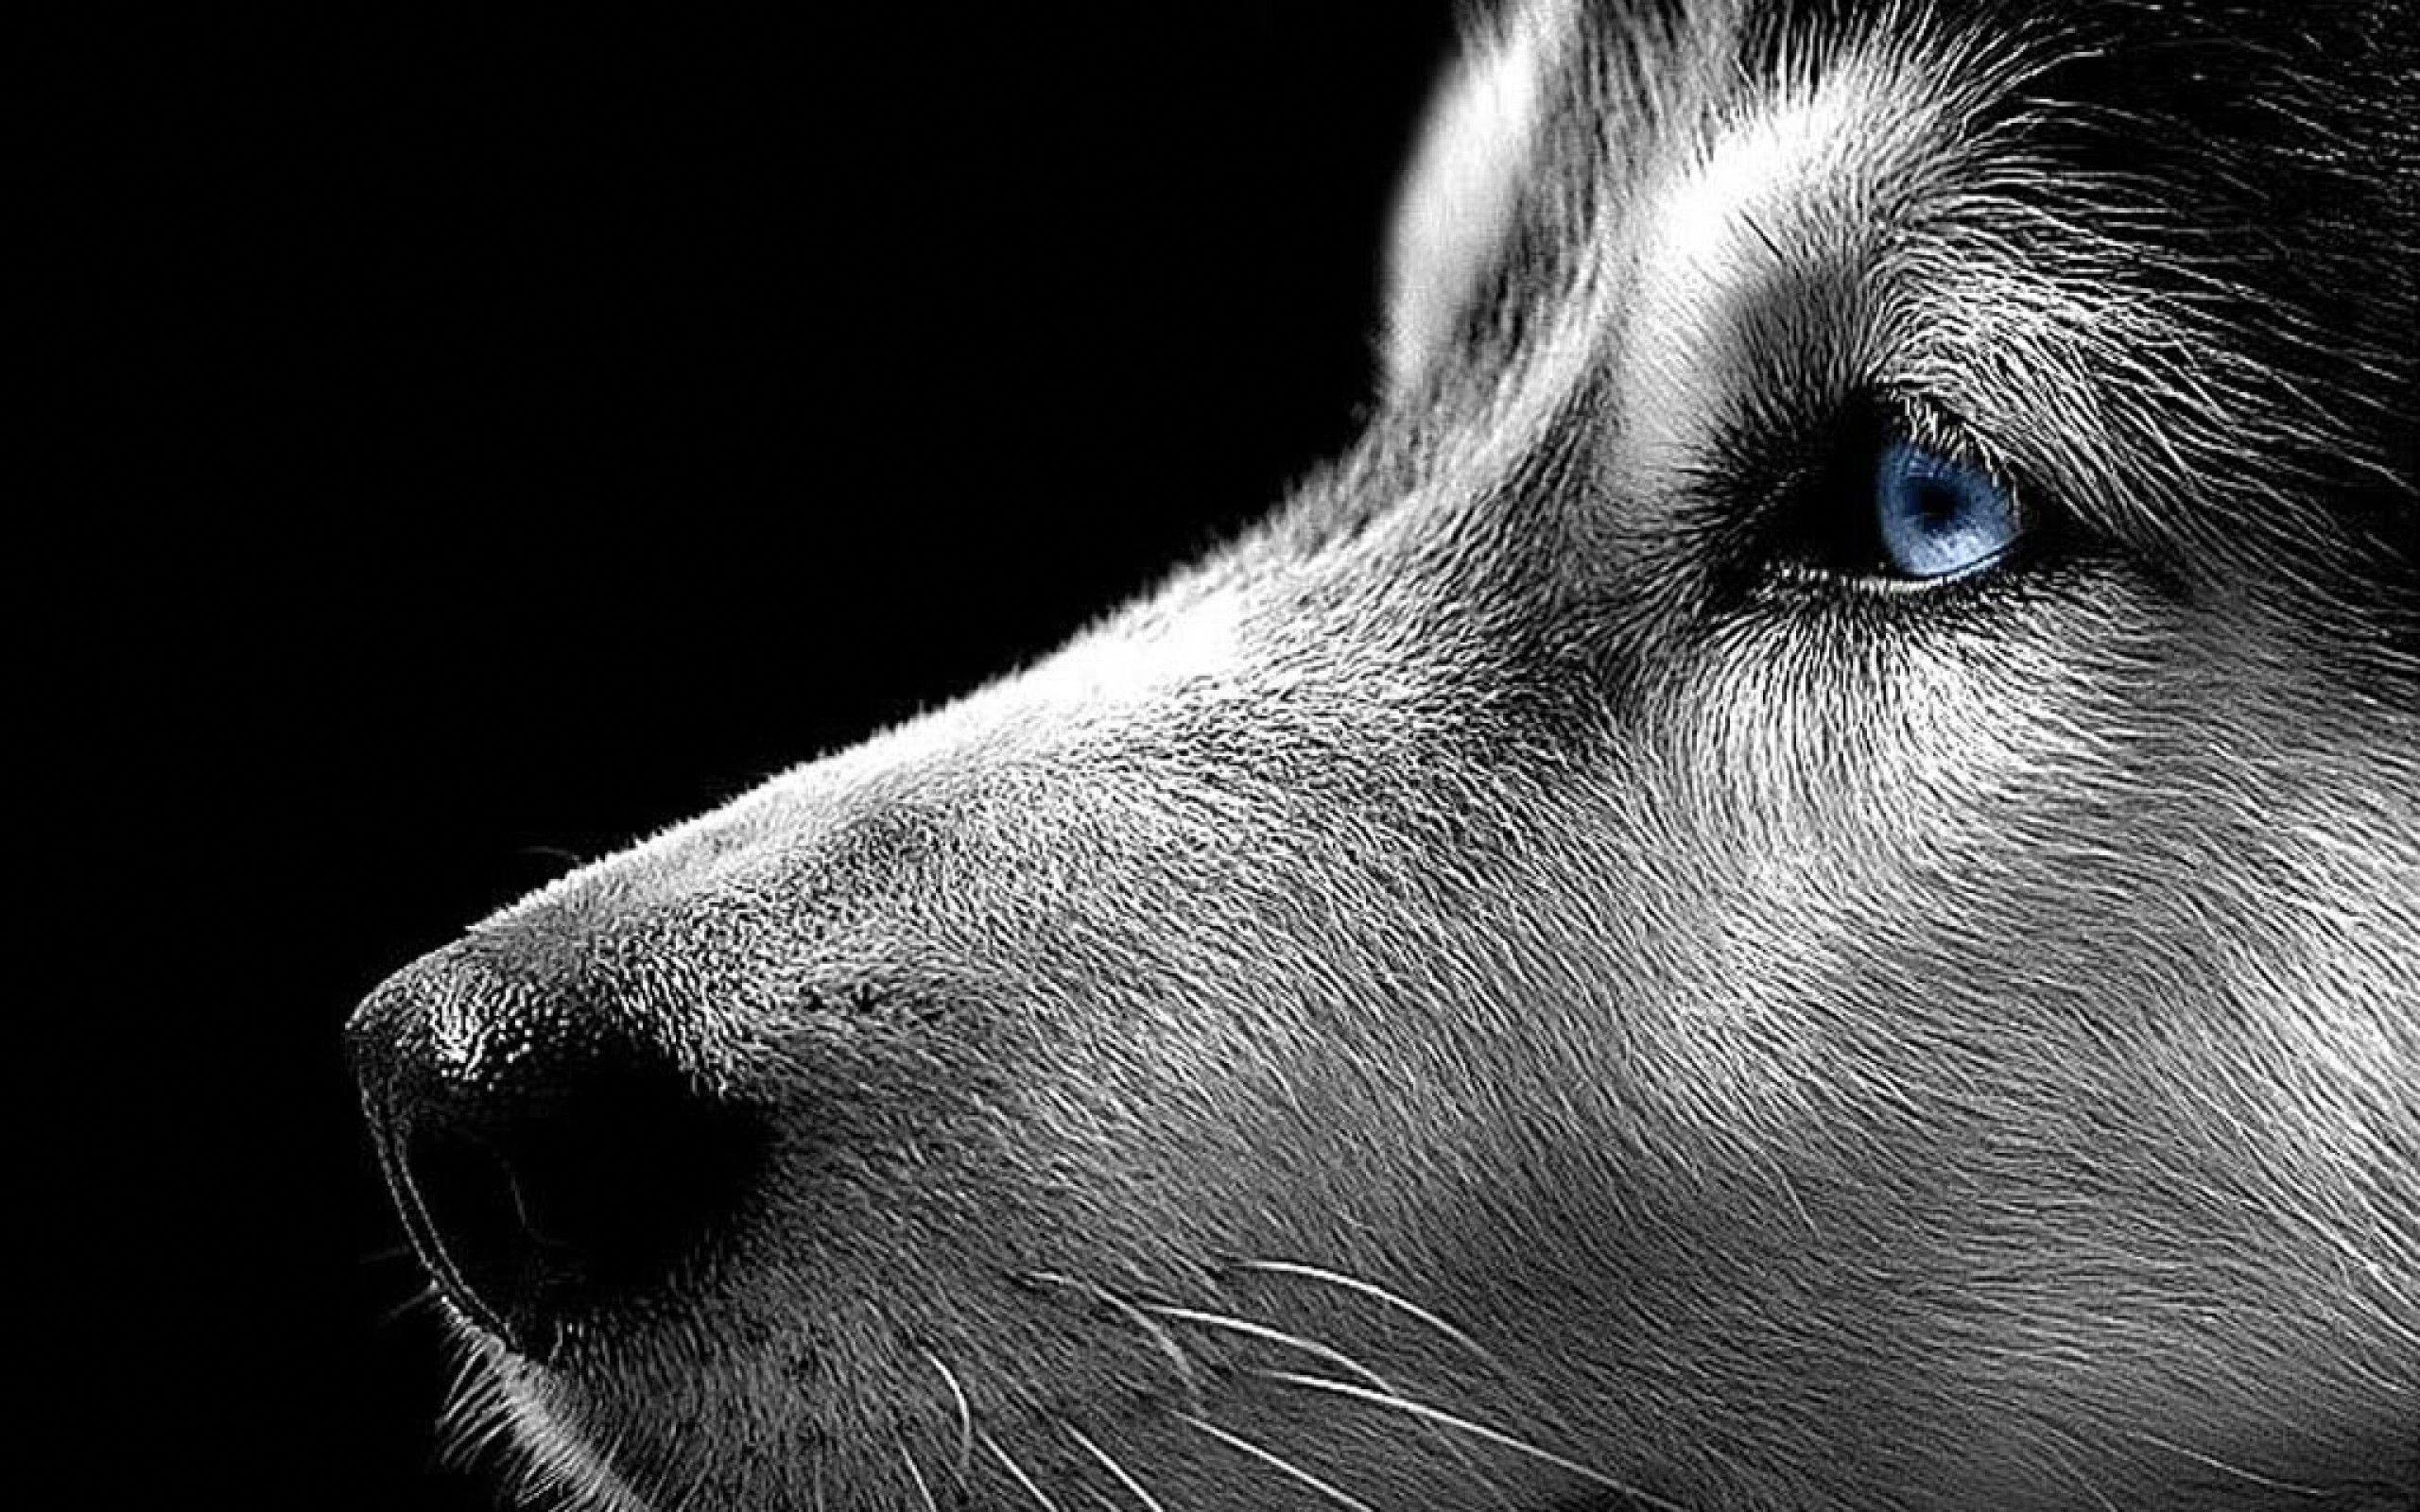 Animals Dogs Puppies Husky Siberian Husky Wallpaper Taken From